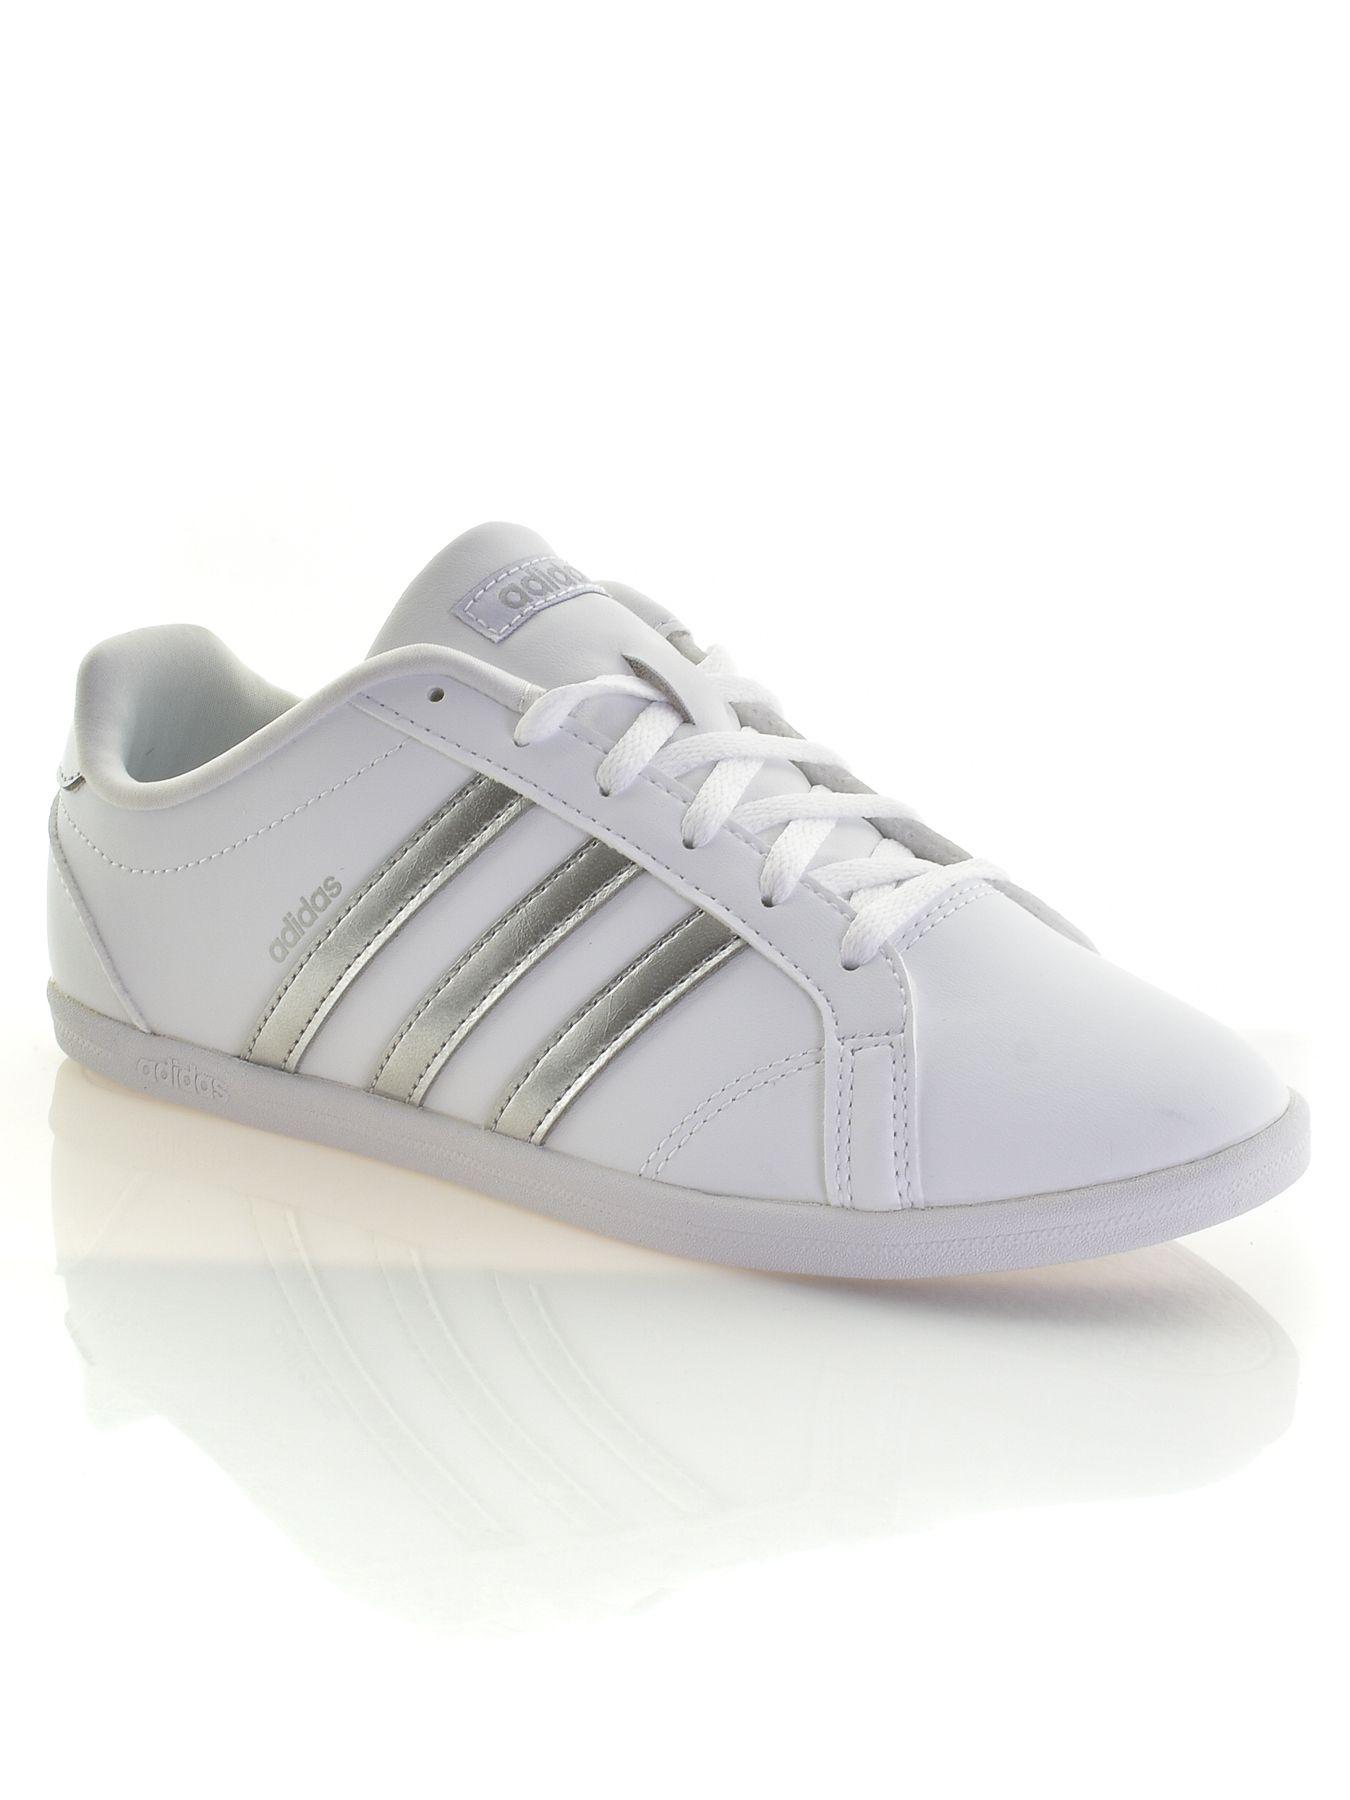 a694c85b2 Adidas női cipő VS ADVANTAGE 1